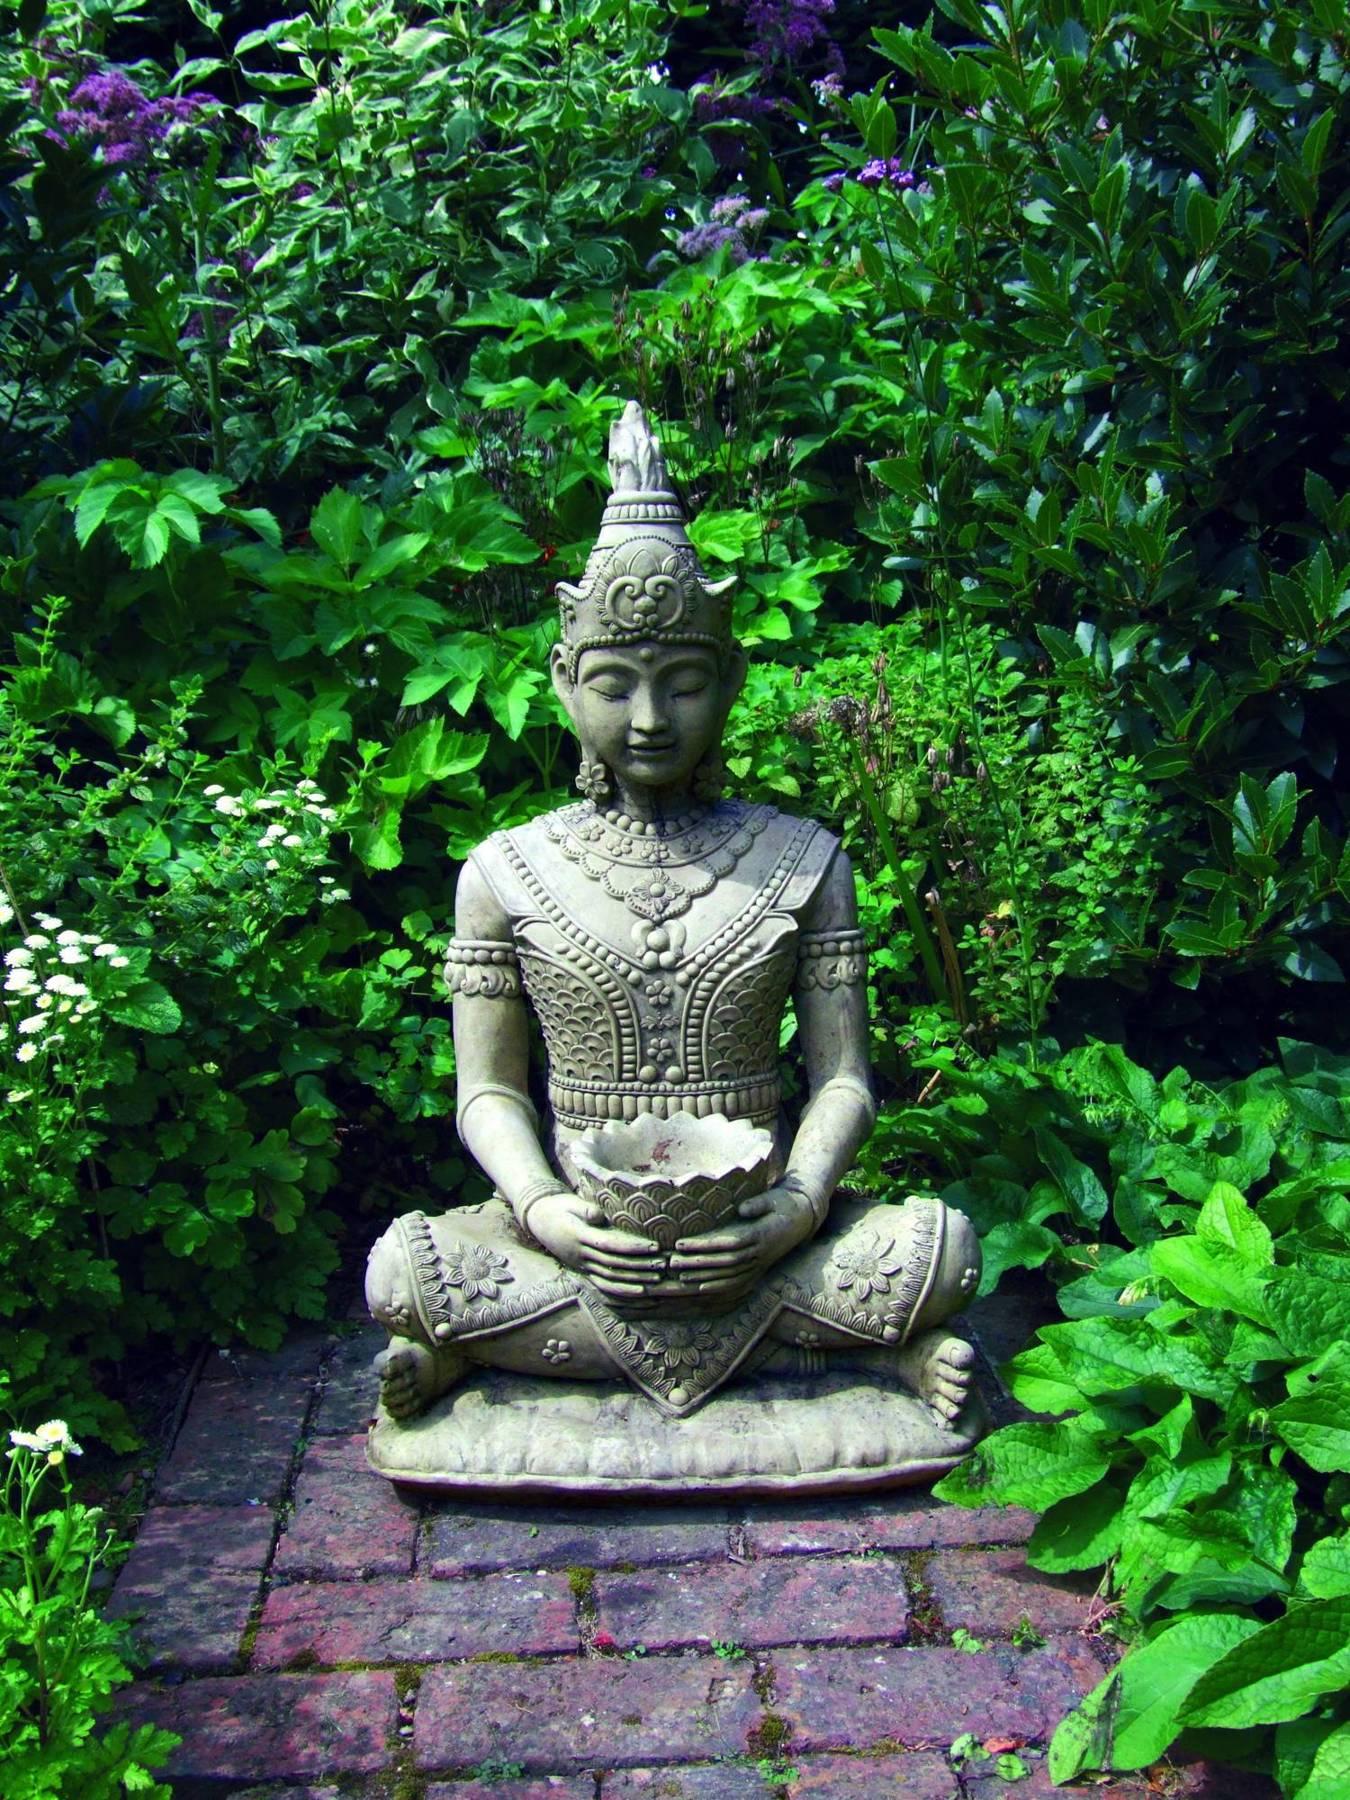 Serene Buddha Statue Garden Ornamnents